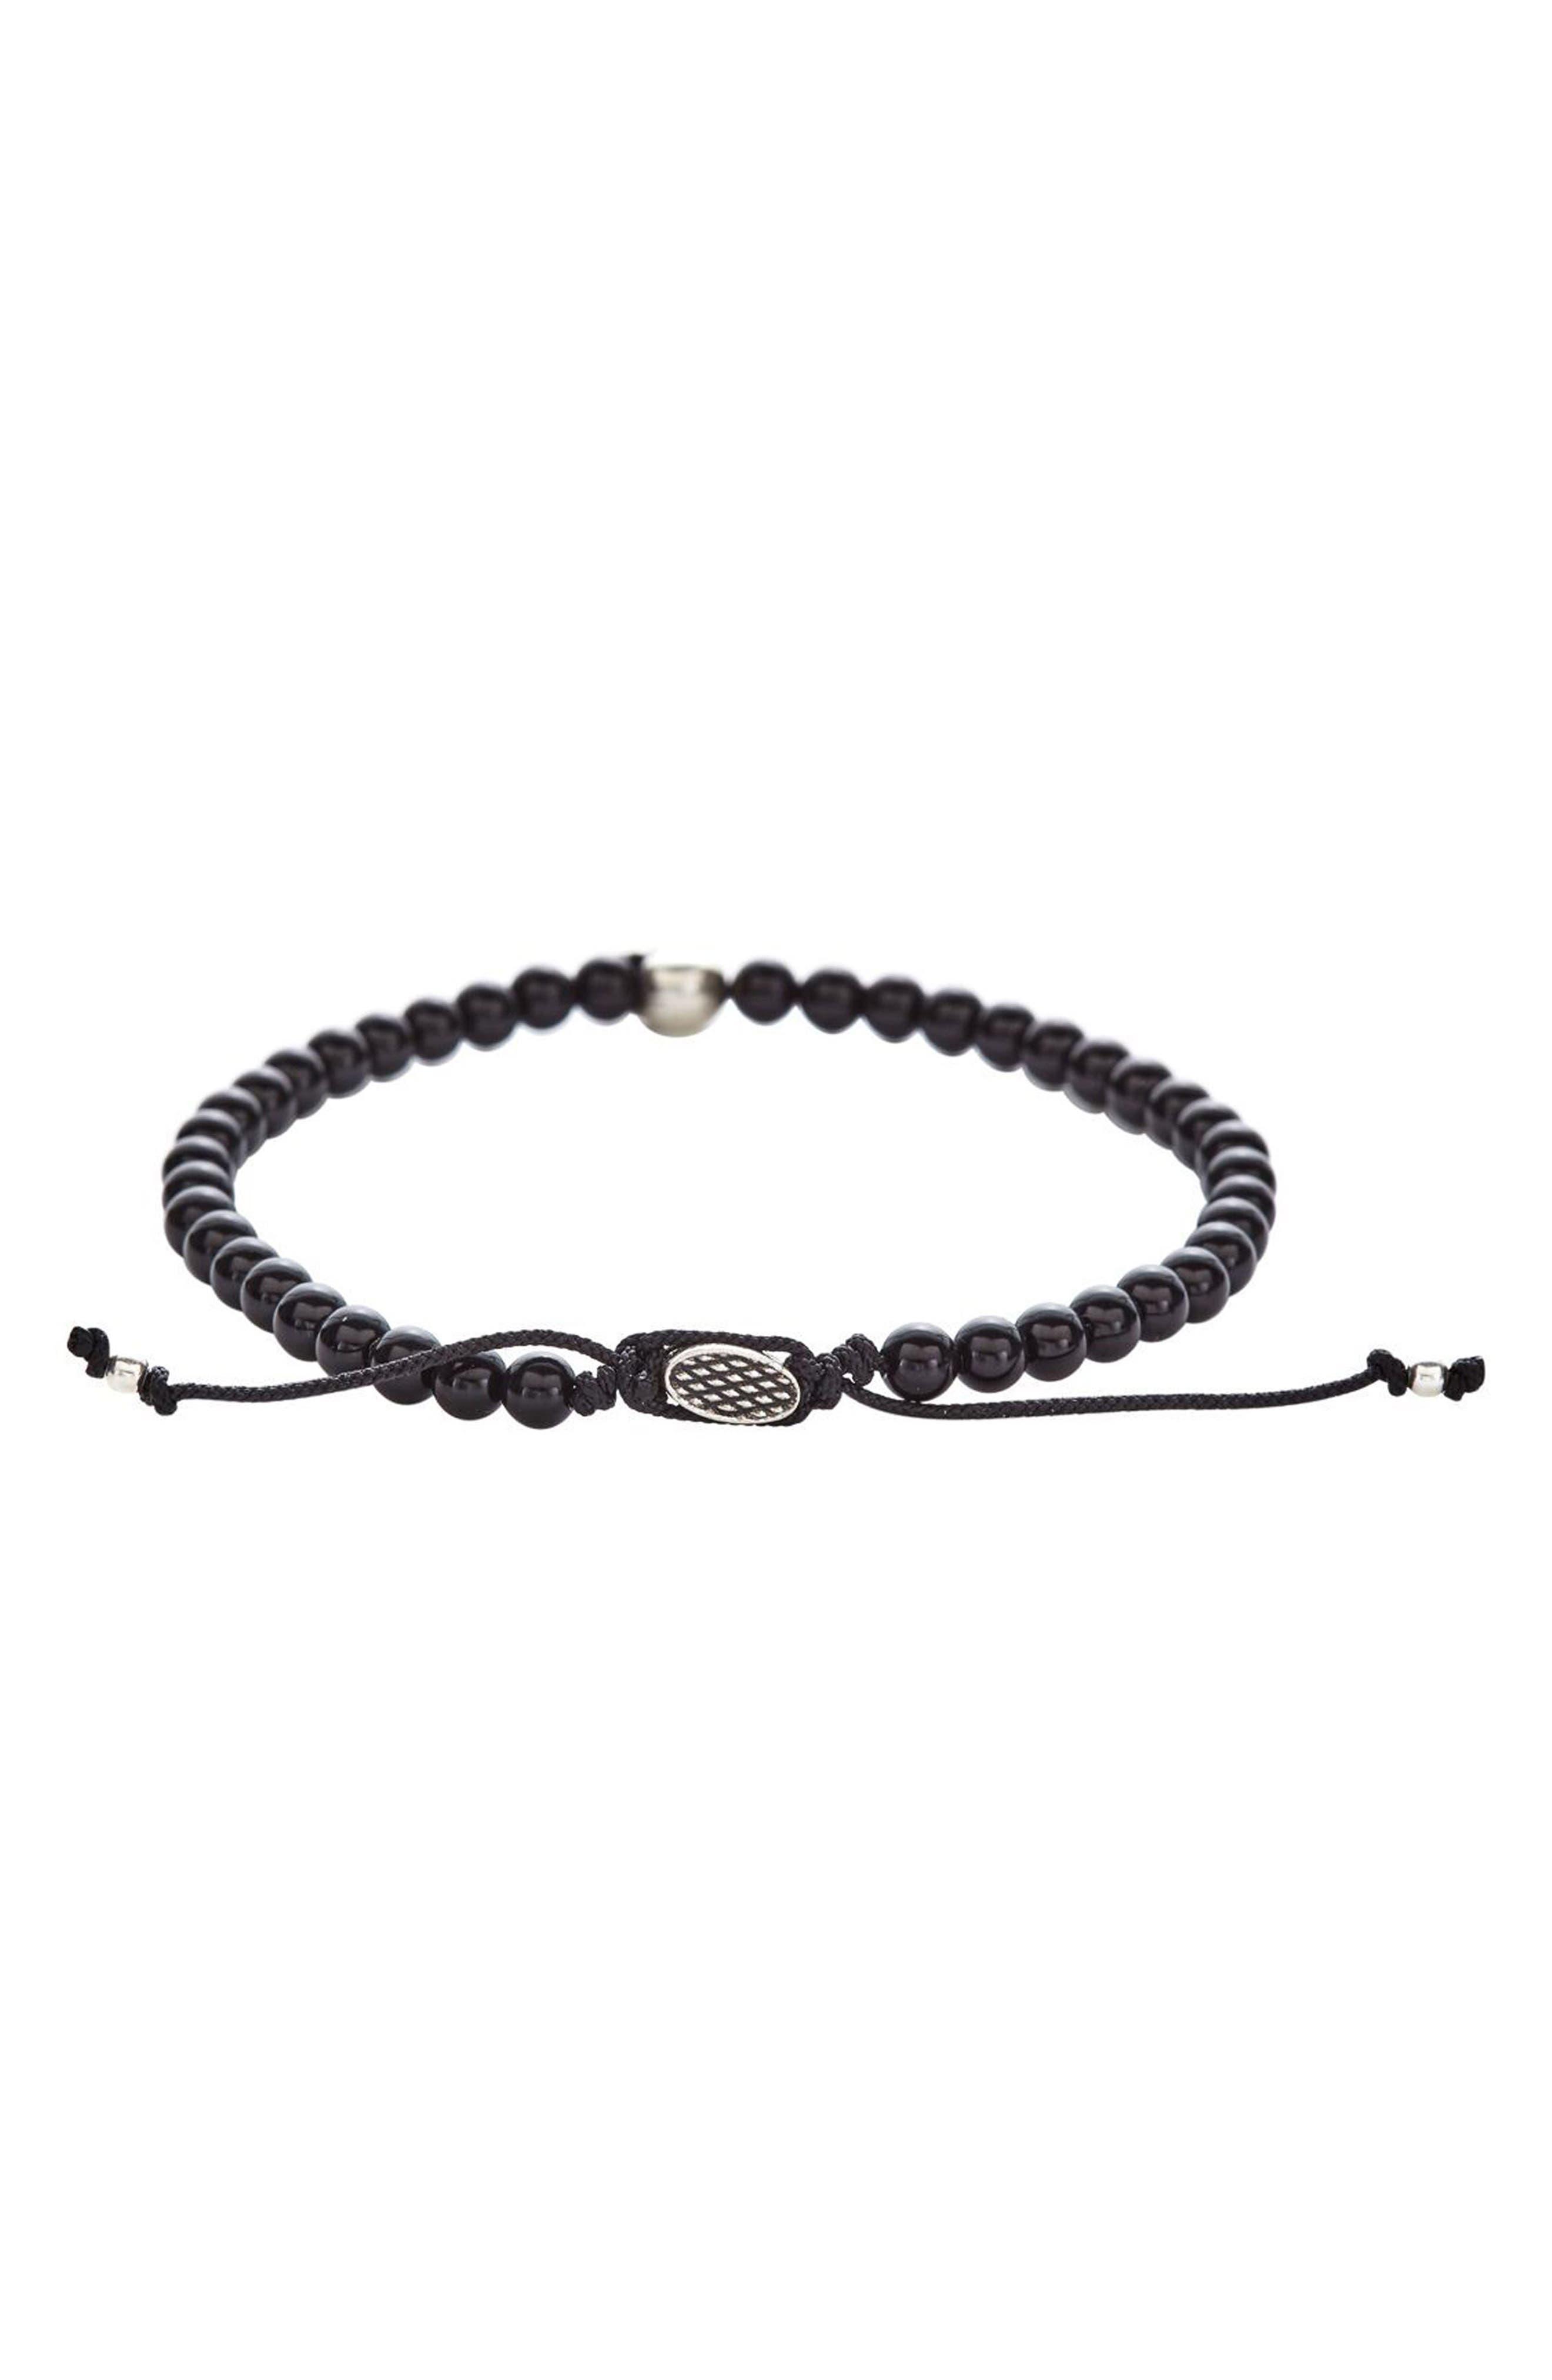 Onyx Bead Bracelet,                         Main,                         color, BLACK